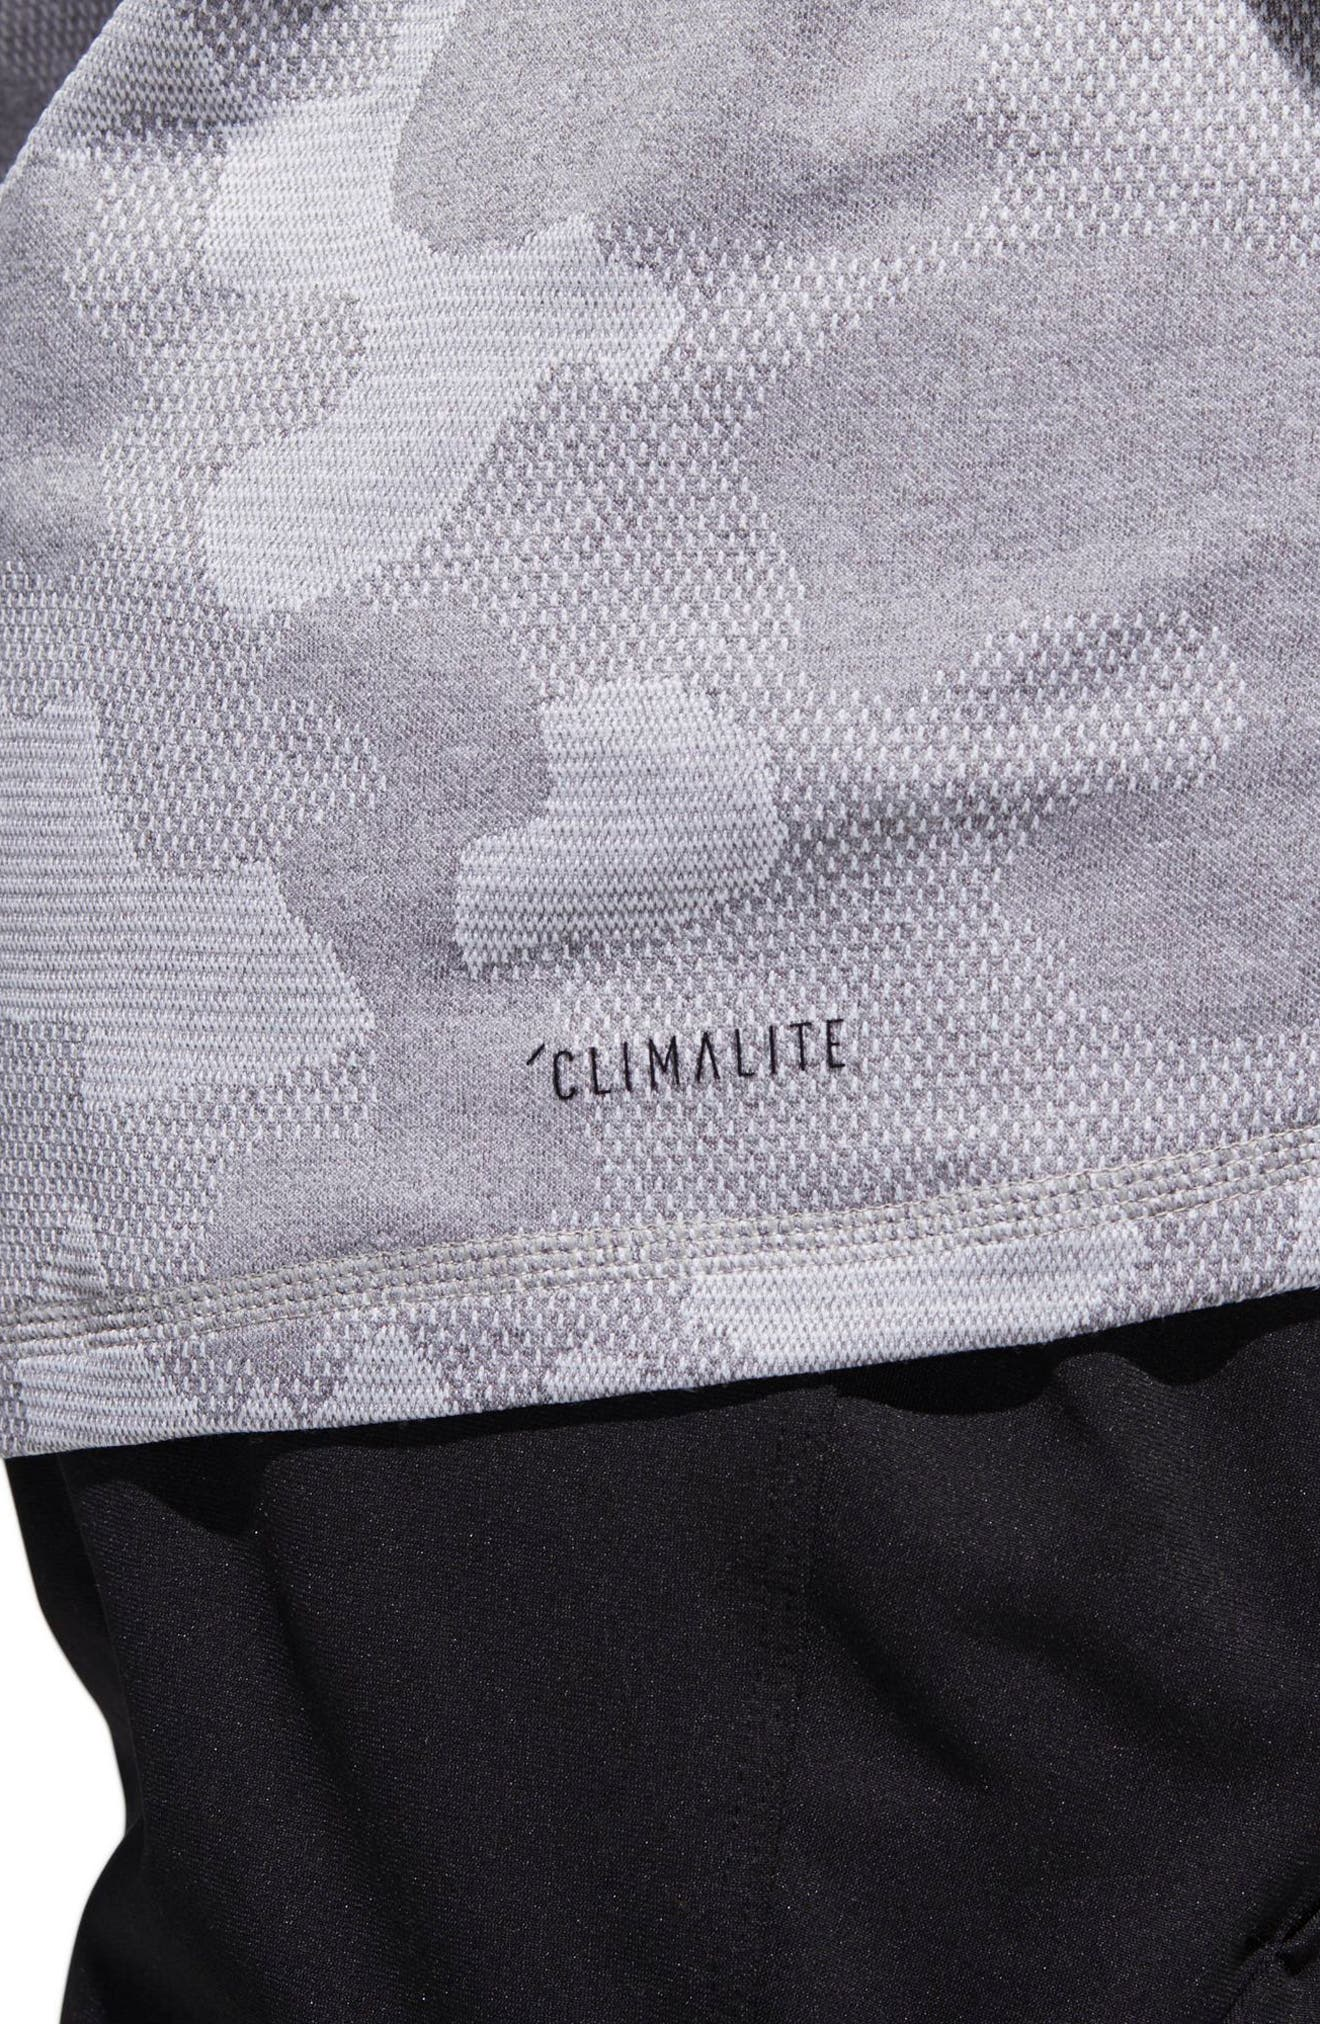 Camo Hype T-Shirt,                             Alternate thumbnail 4, color,                             036